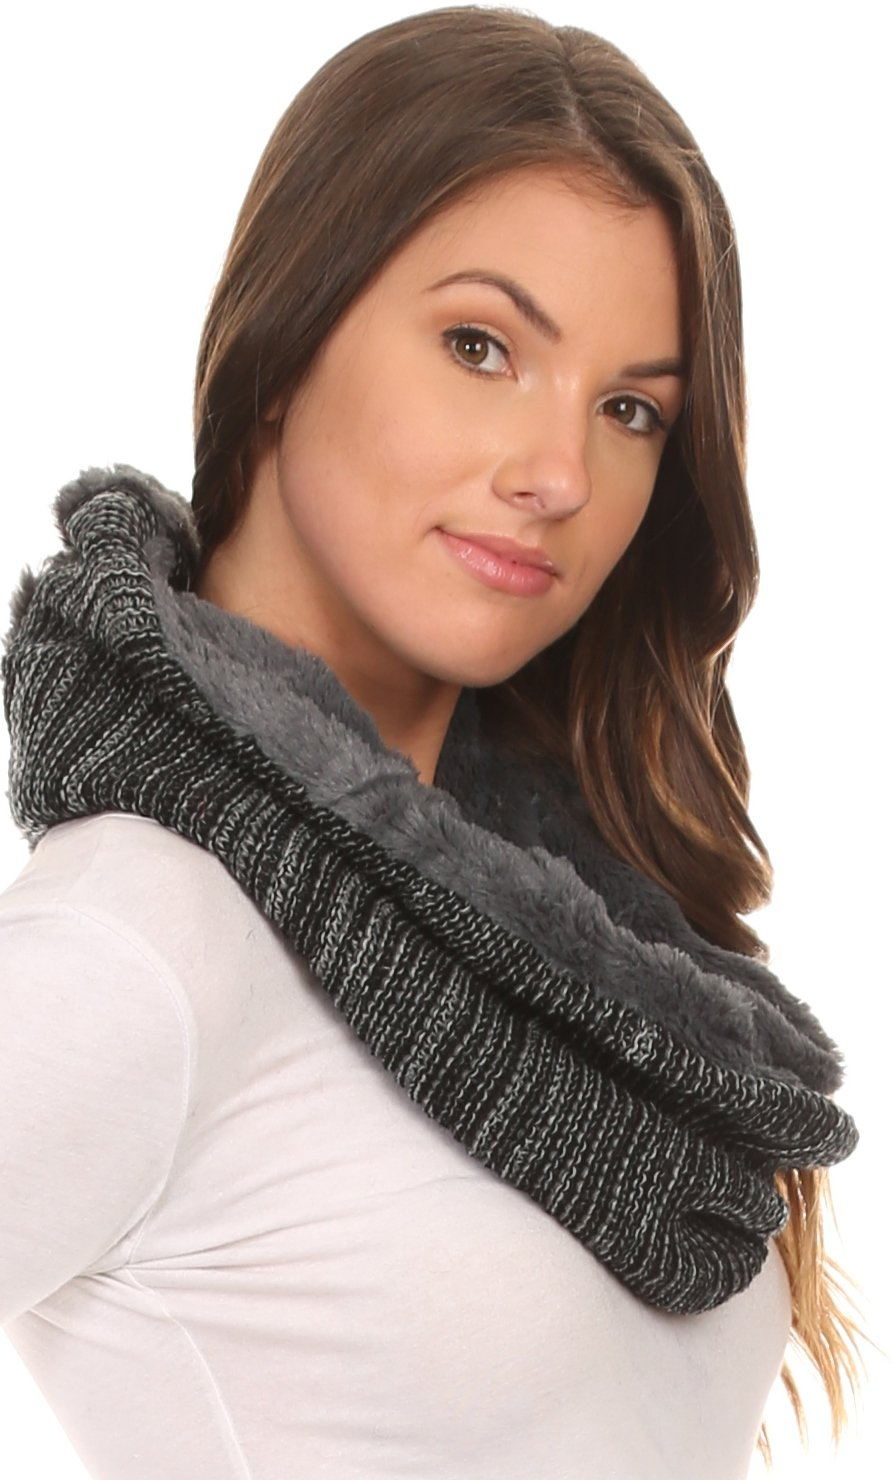 Sakkas 16107 - Sele Short Two Textured Faux Fur Ribbed Knit Mixed Designed Infinity Scarf - Grey - OS by Sakkas (Image #4)